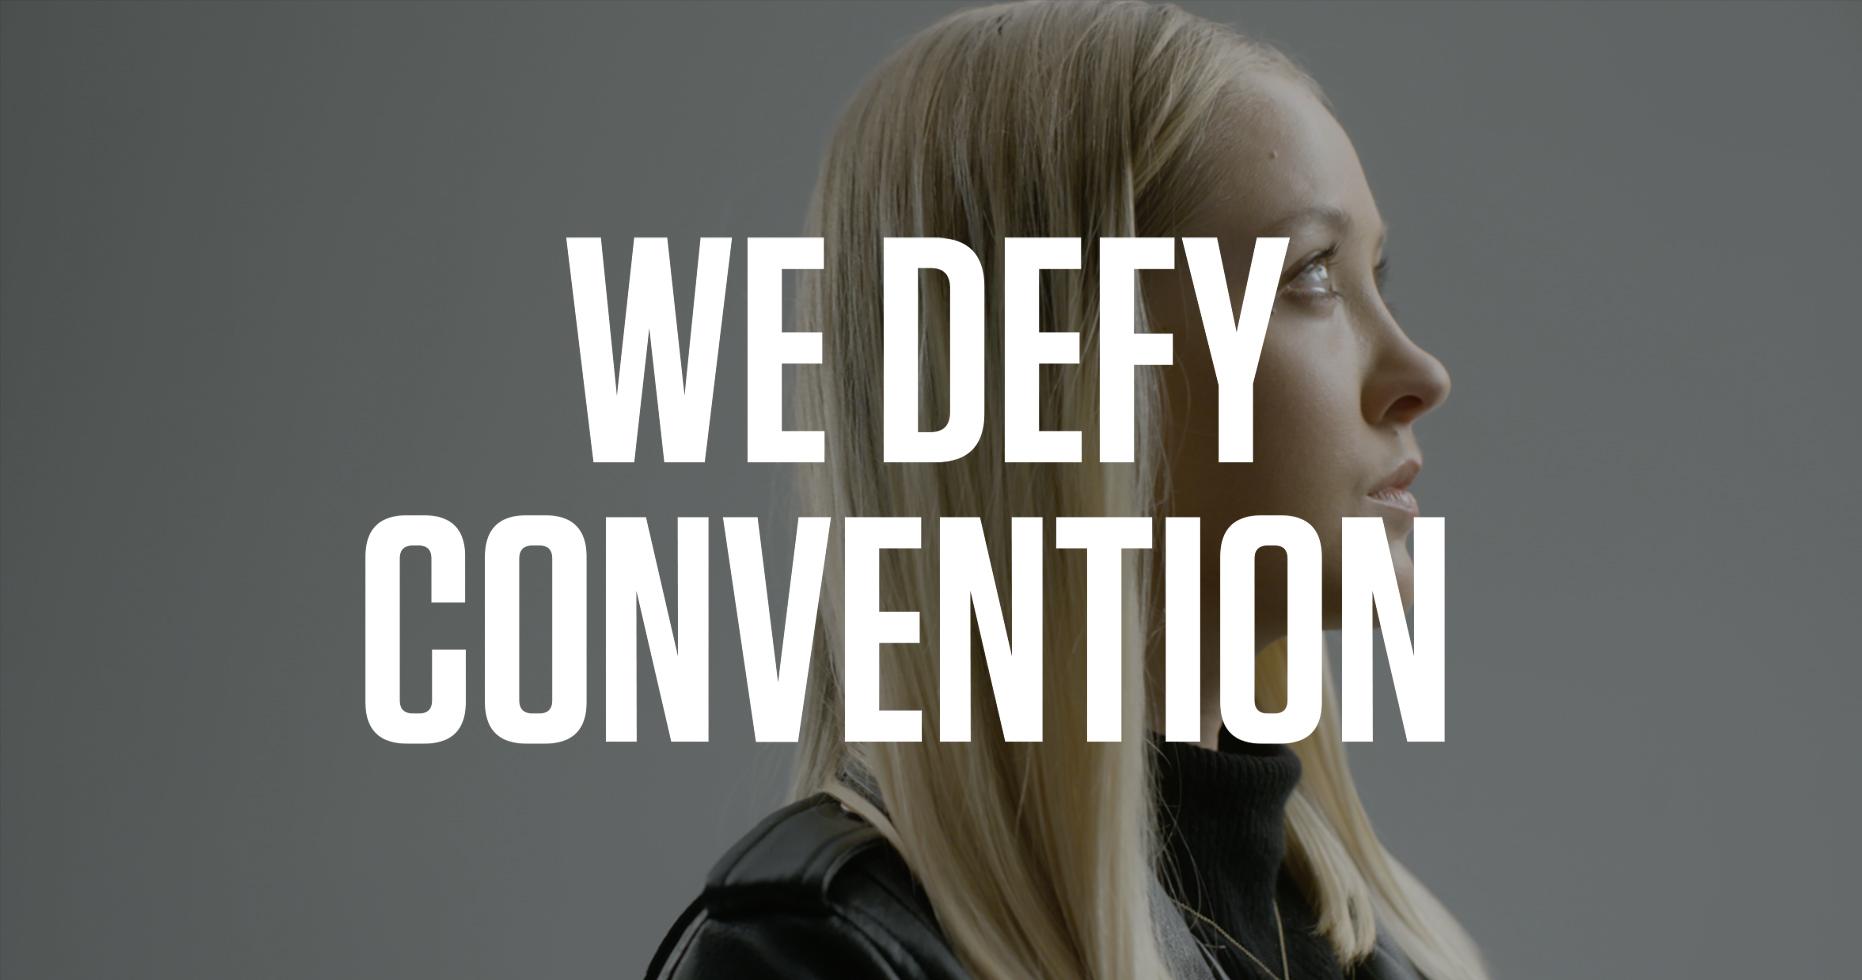 Dorota Szulc portrait with the words 'we defy convention'